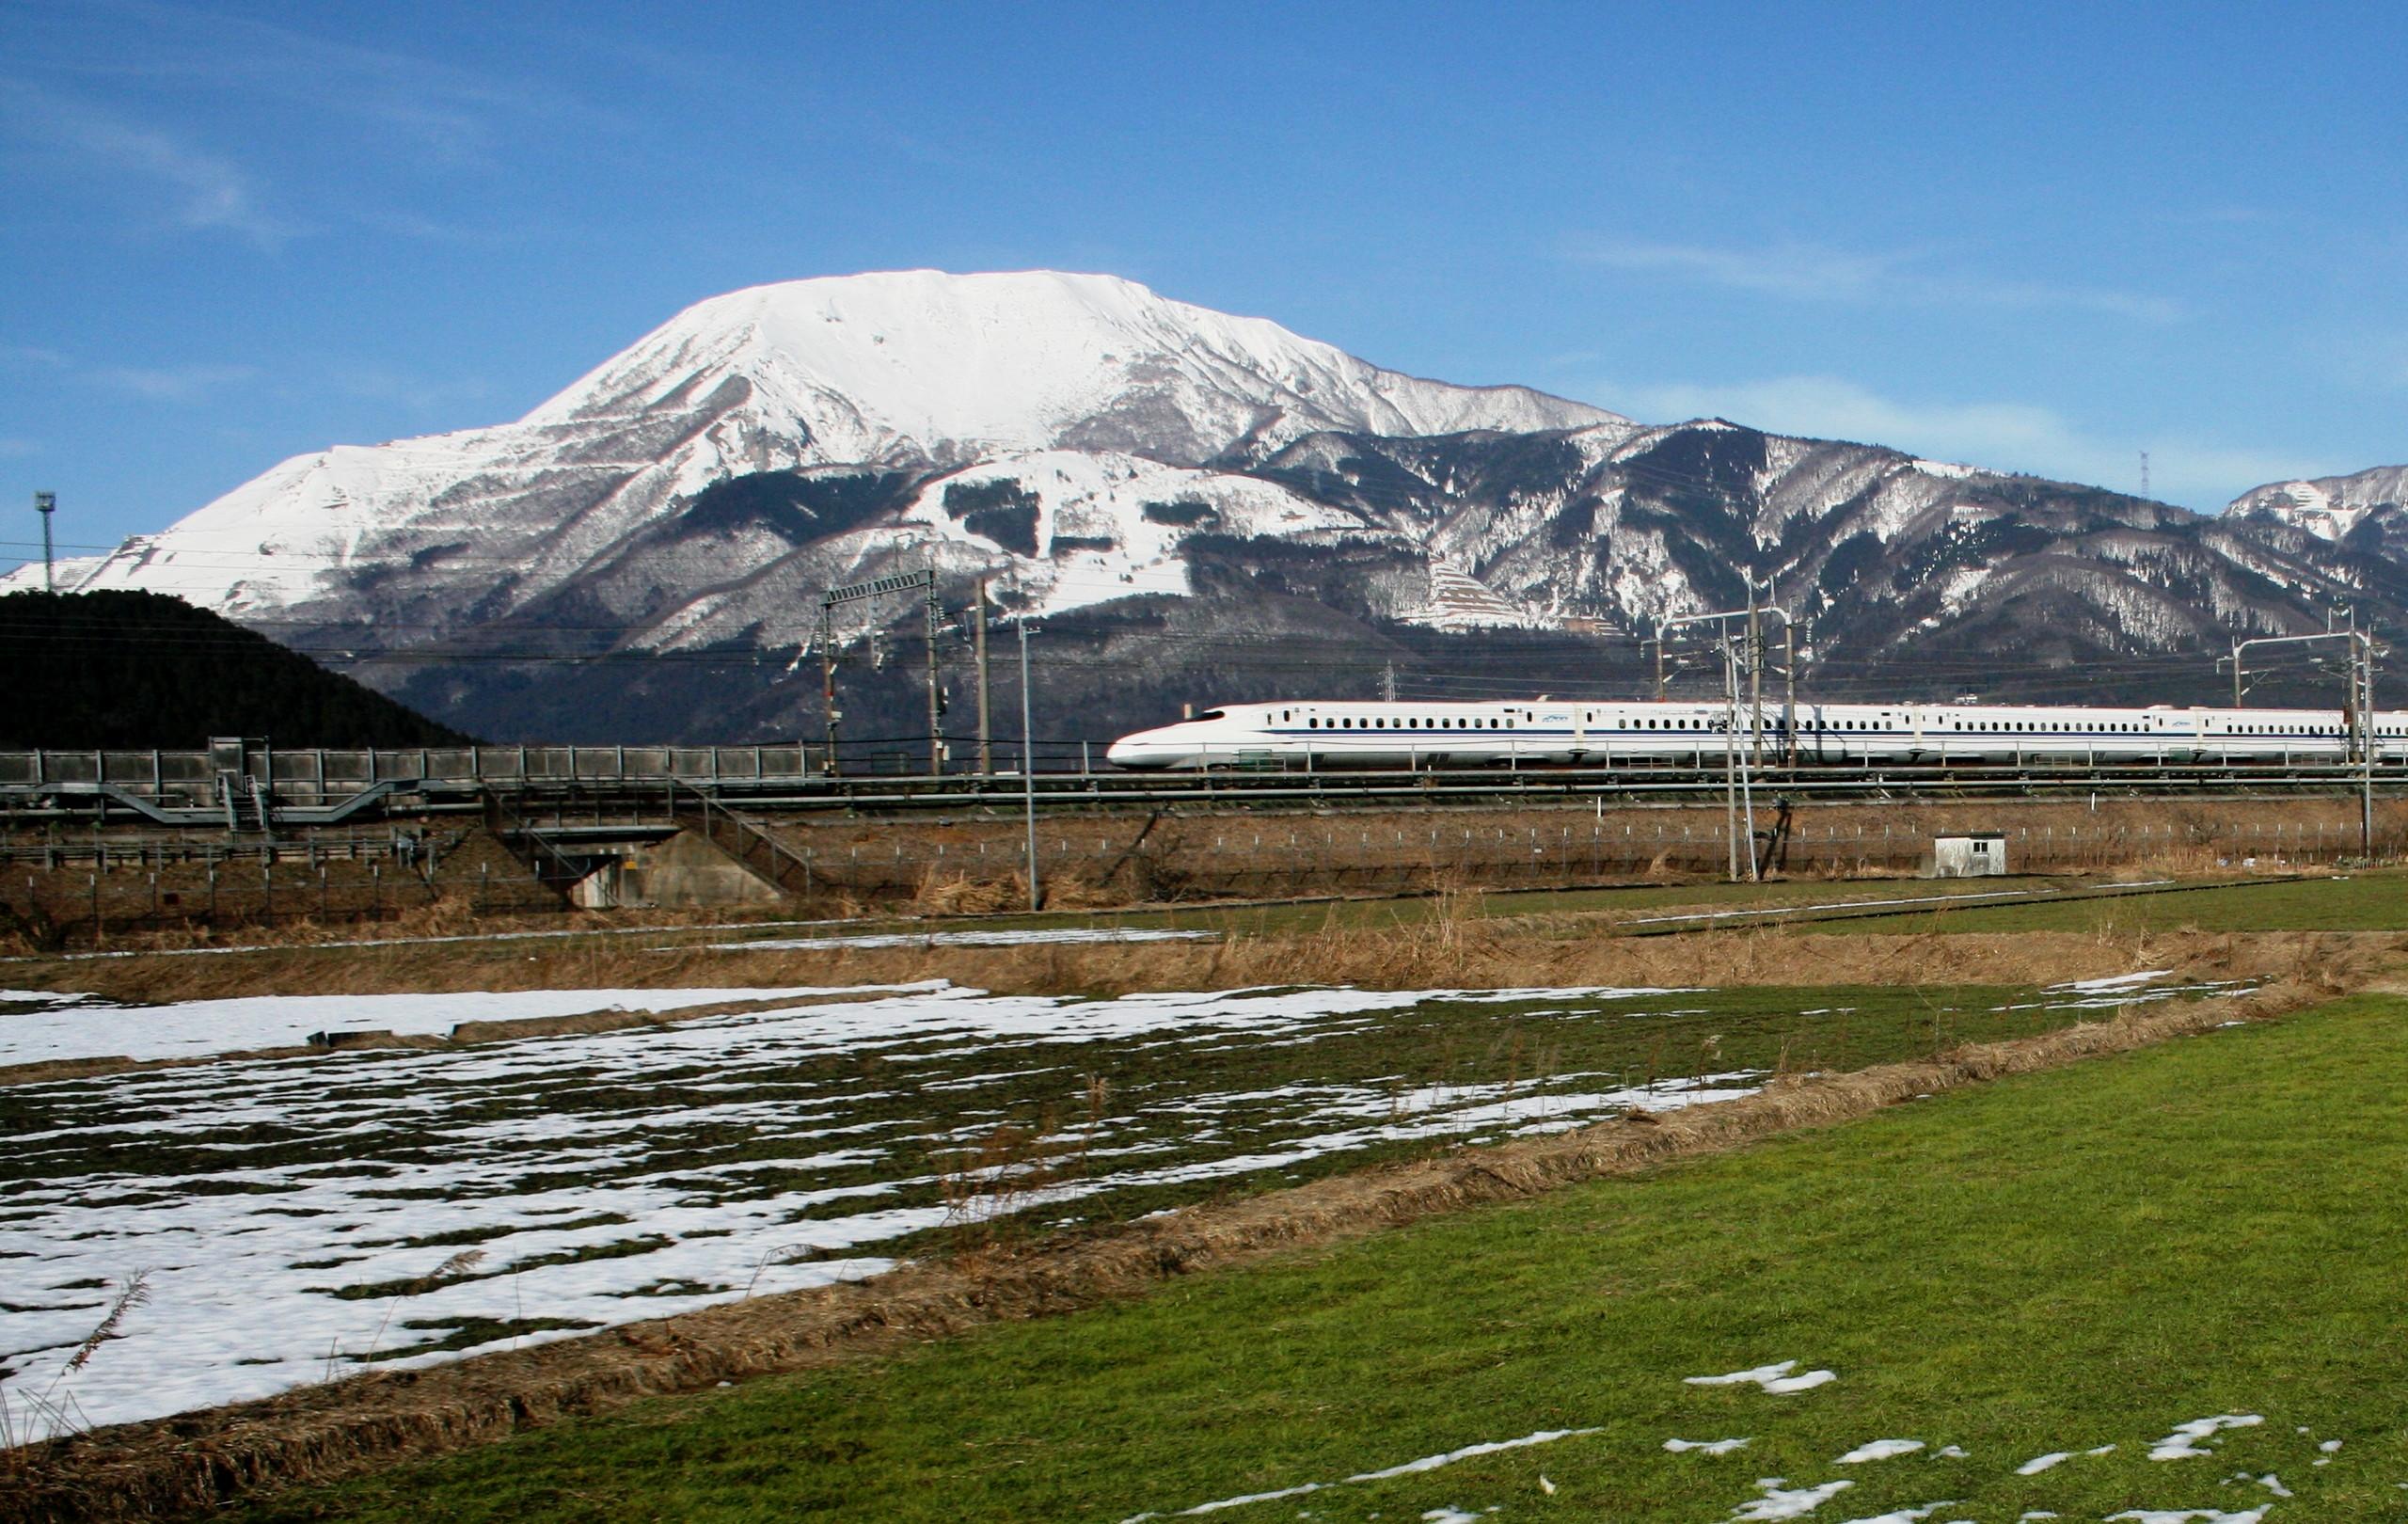 http://upload.wikimedia.org/wikipedia/commons/7/73/Mount_Ibuki_and_N700_Series_Shinkansen.jpg